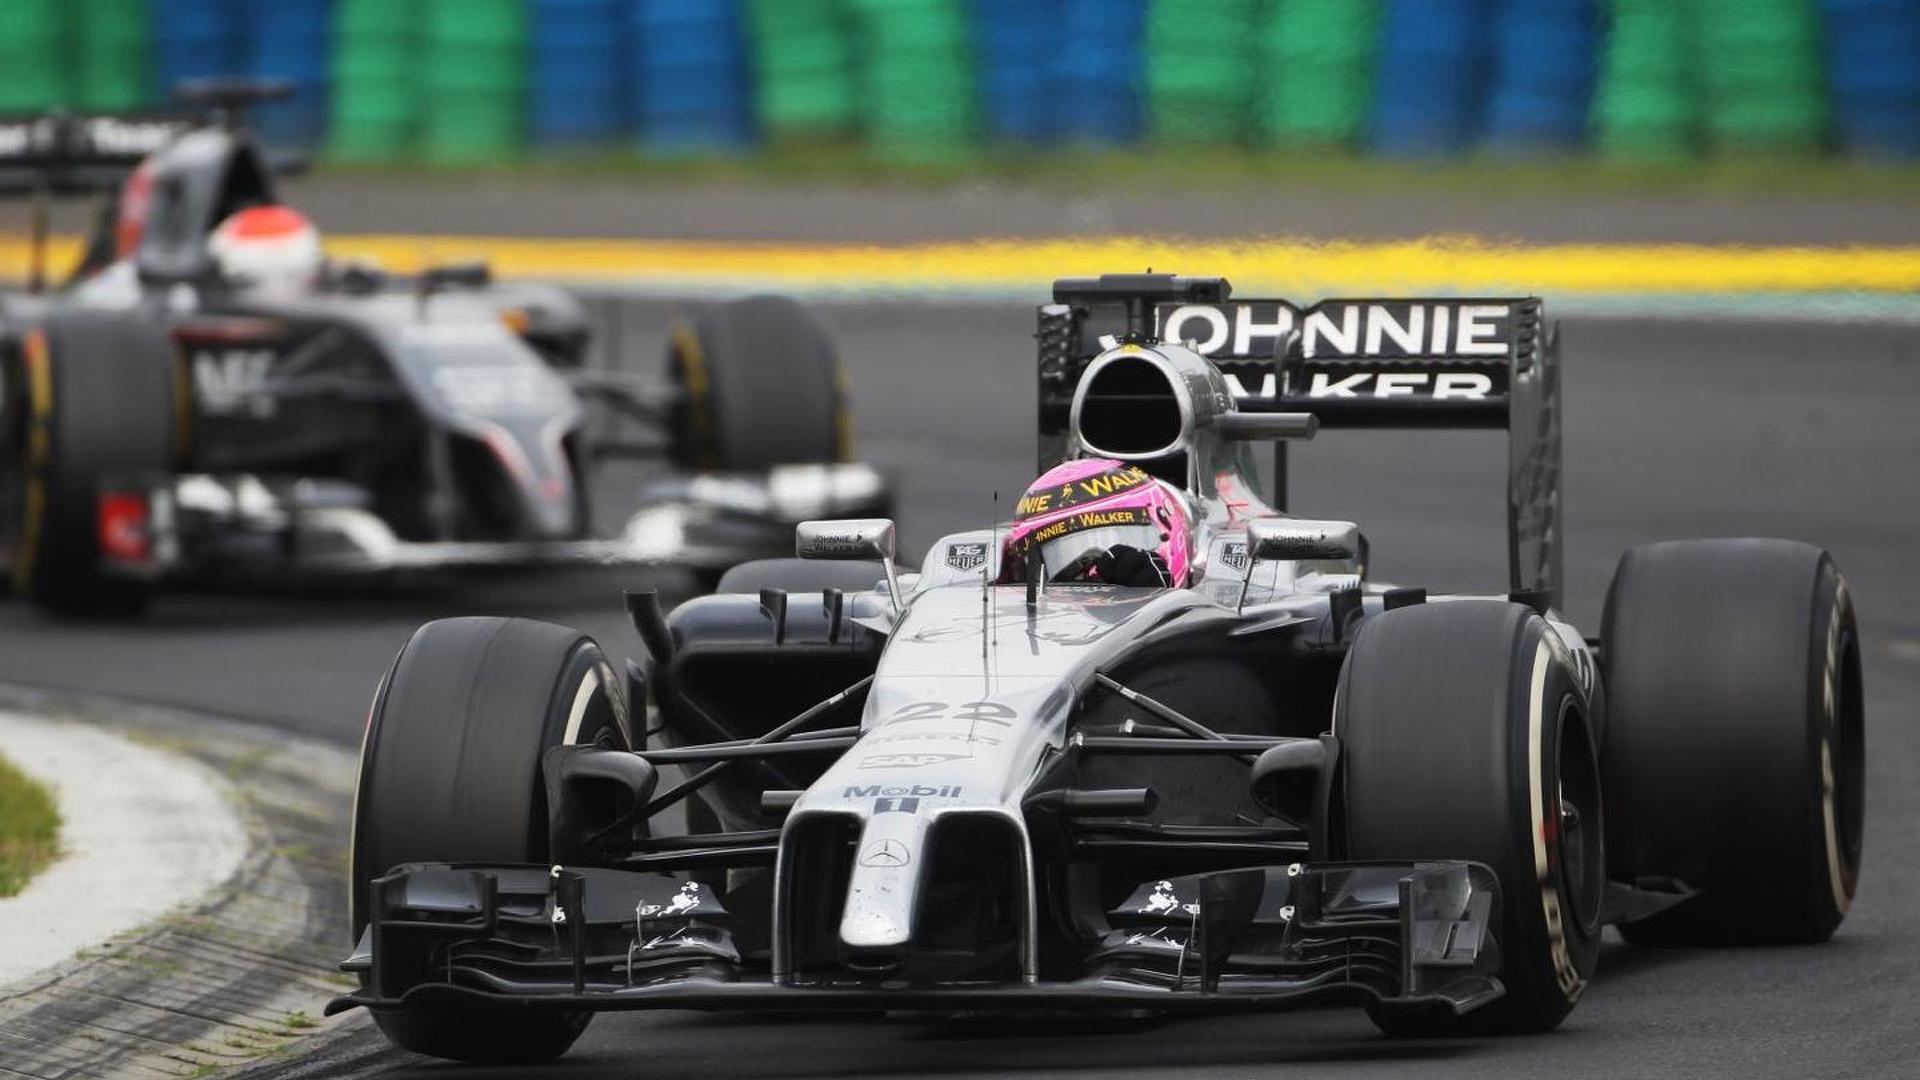 McLaren looking to 'refresh' driver lineup - Boullier